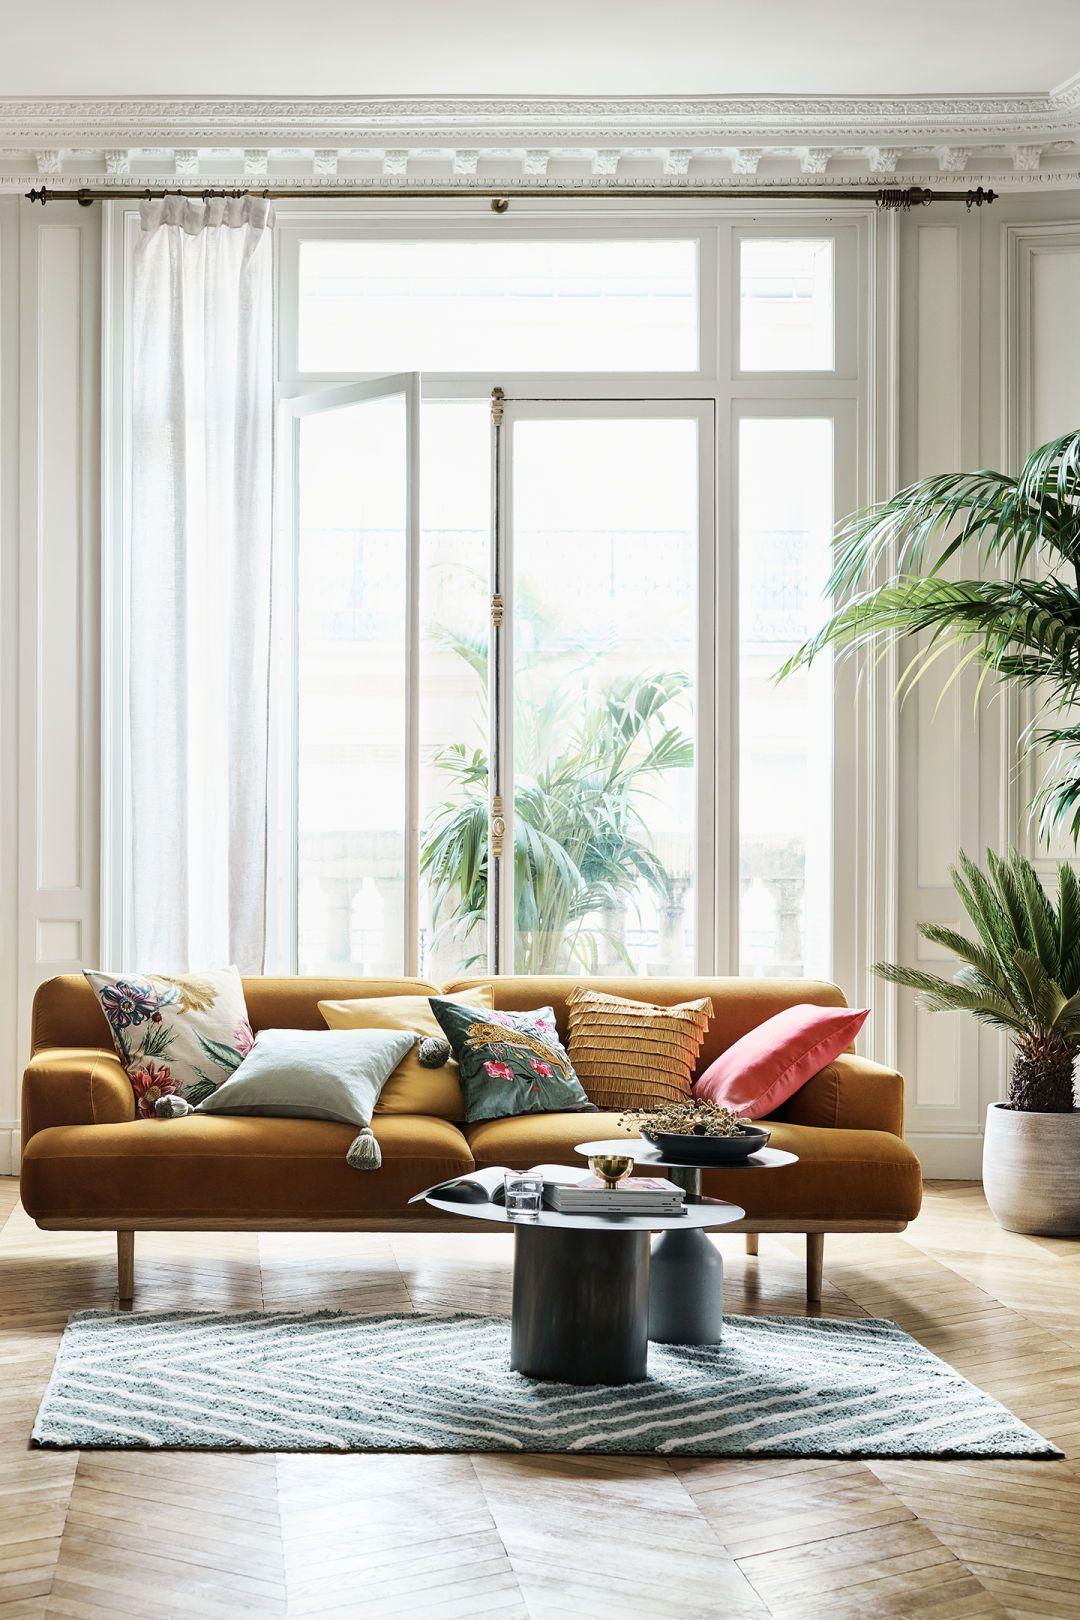 Decorating A Room Online: Interior Design